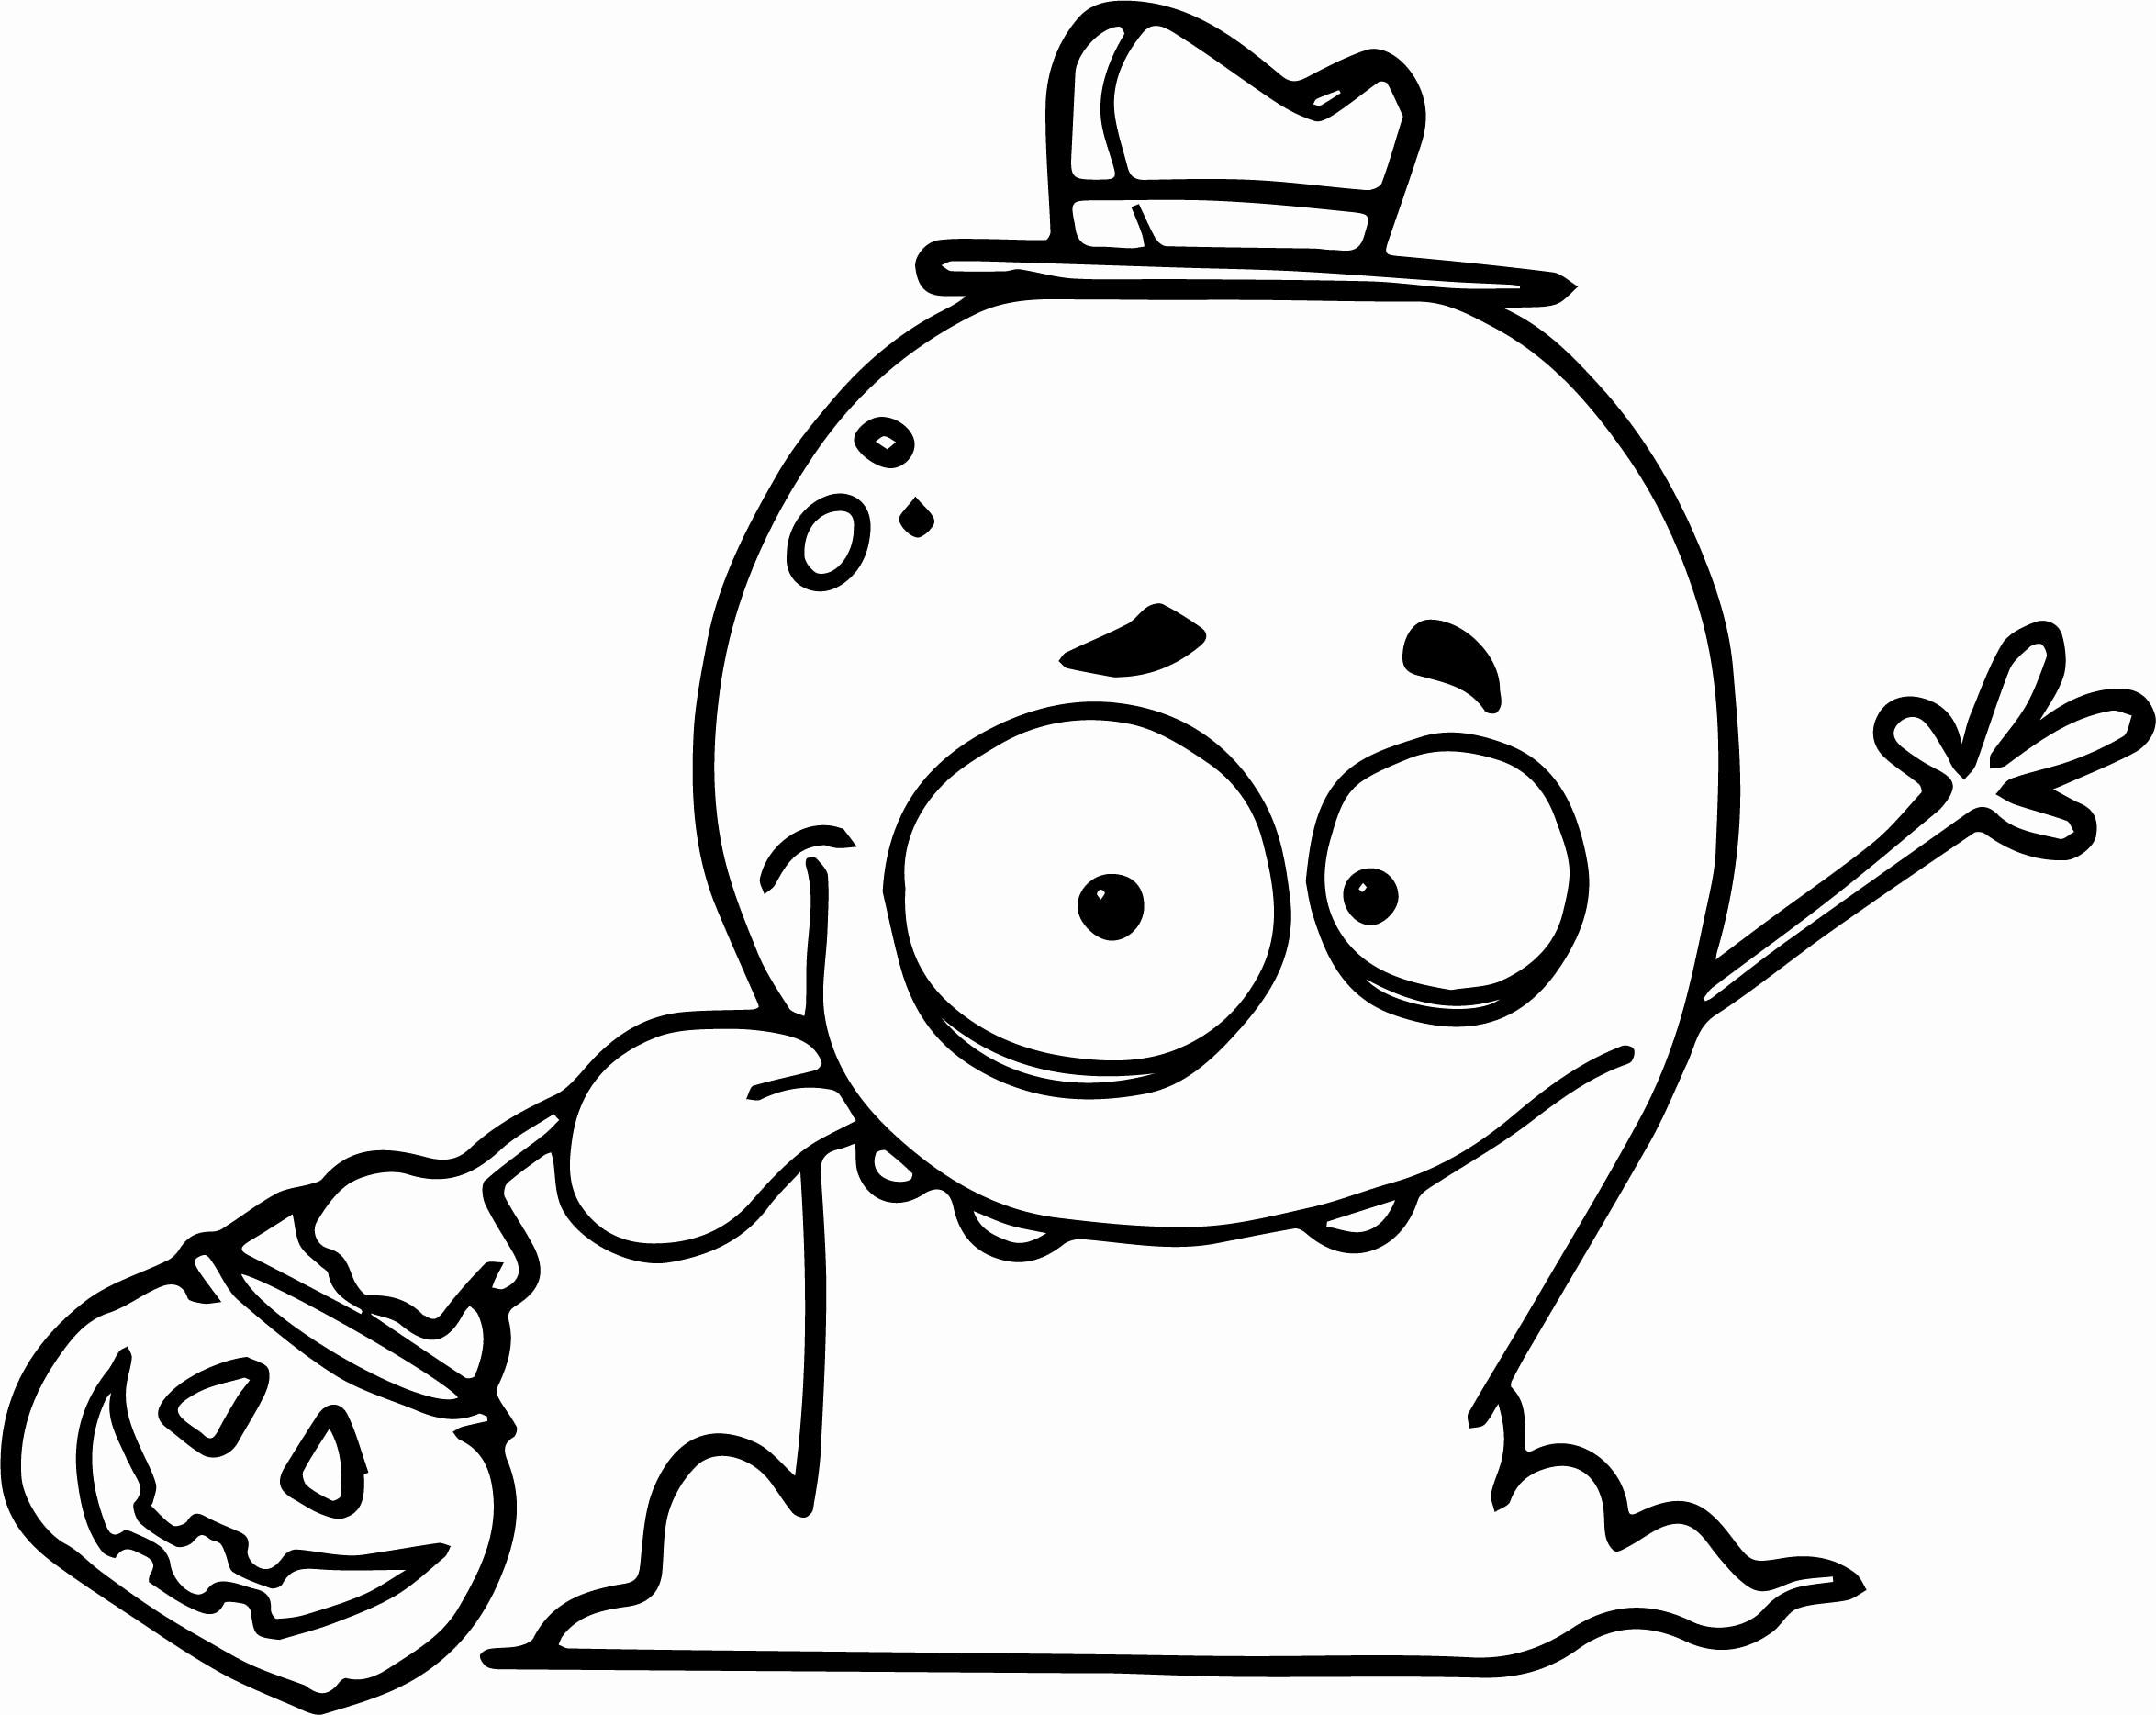 2349x1868 Encantador Monsters Inc Coloring Pages Mike